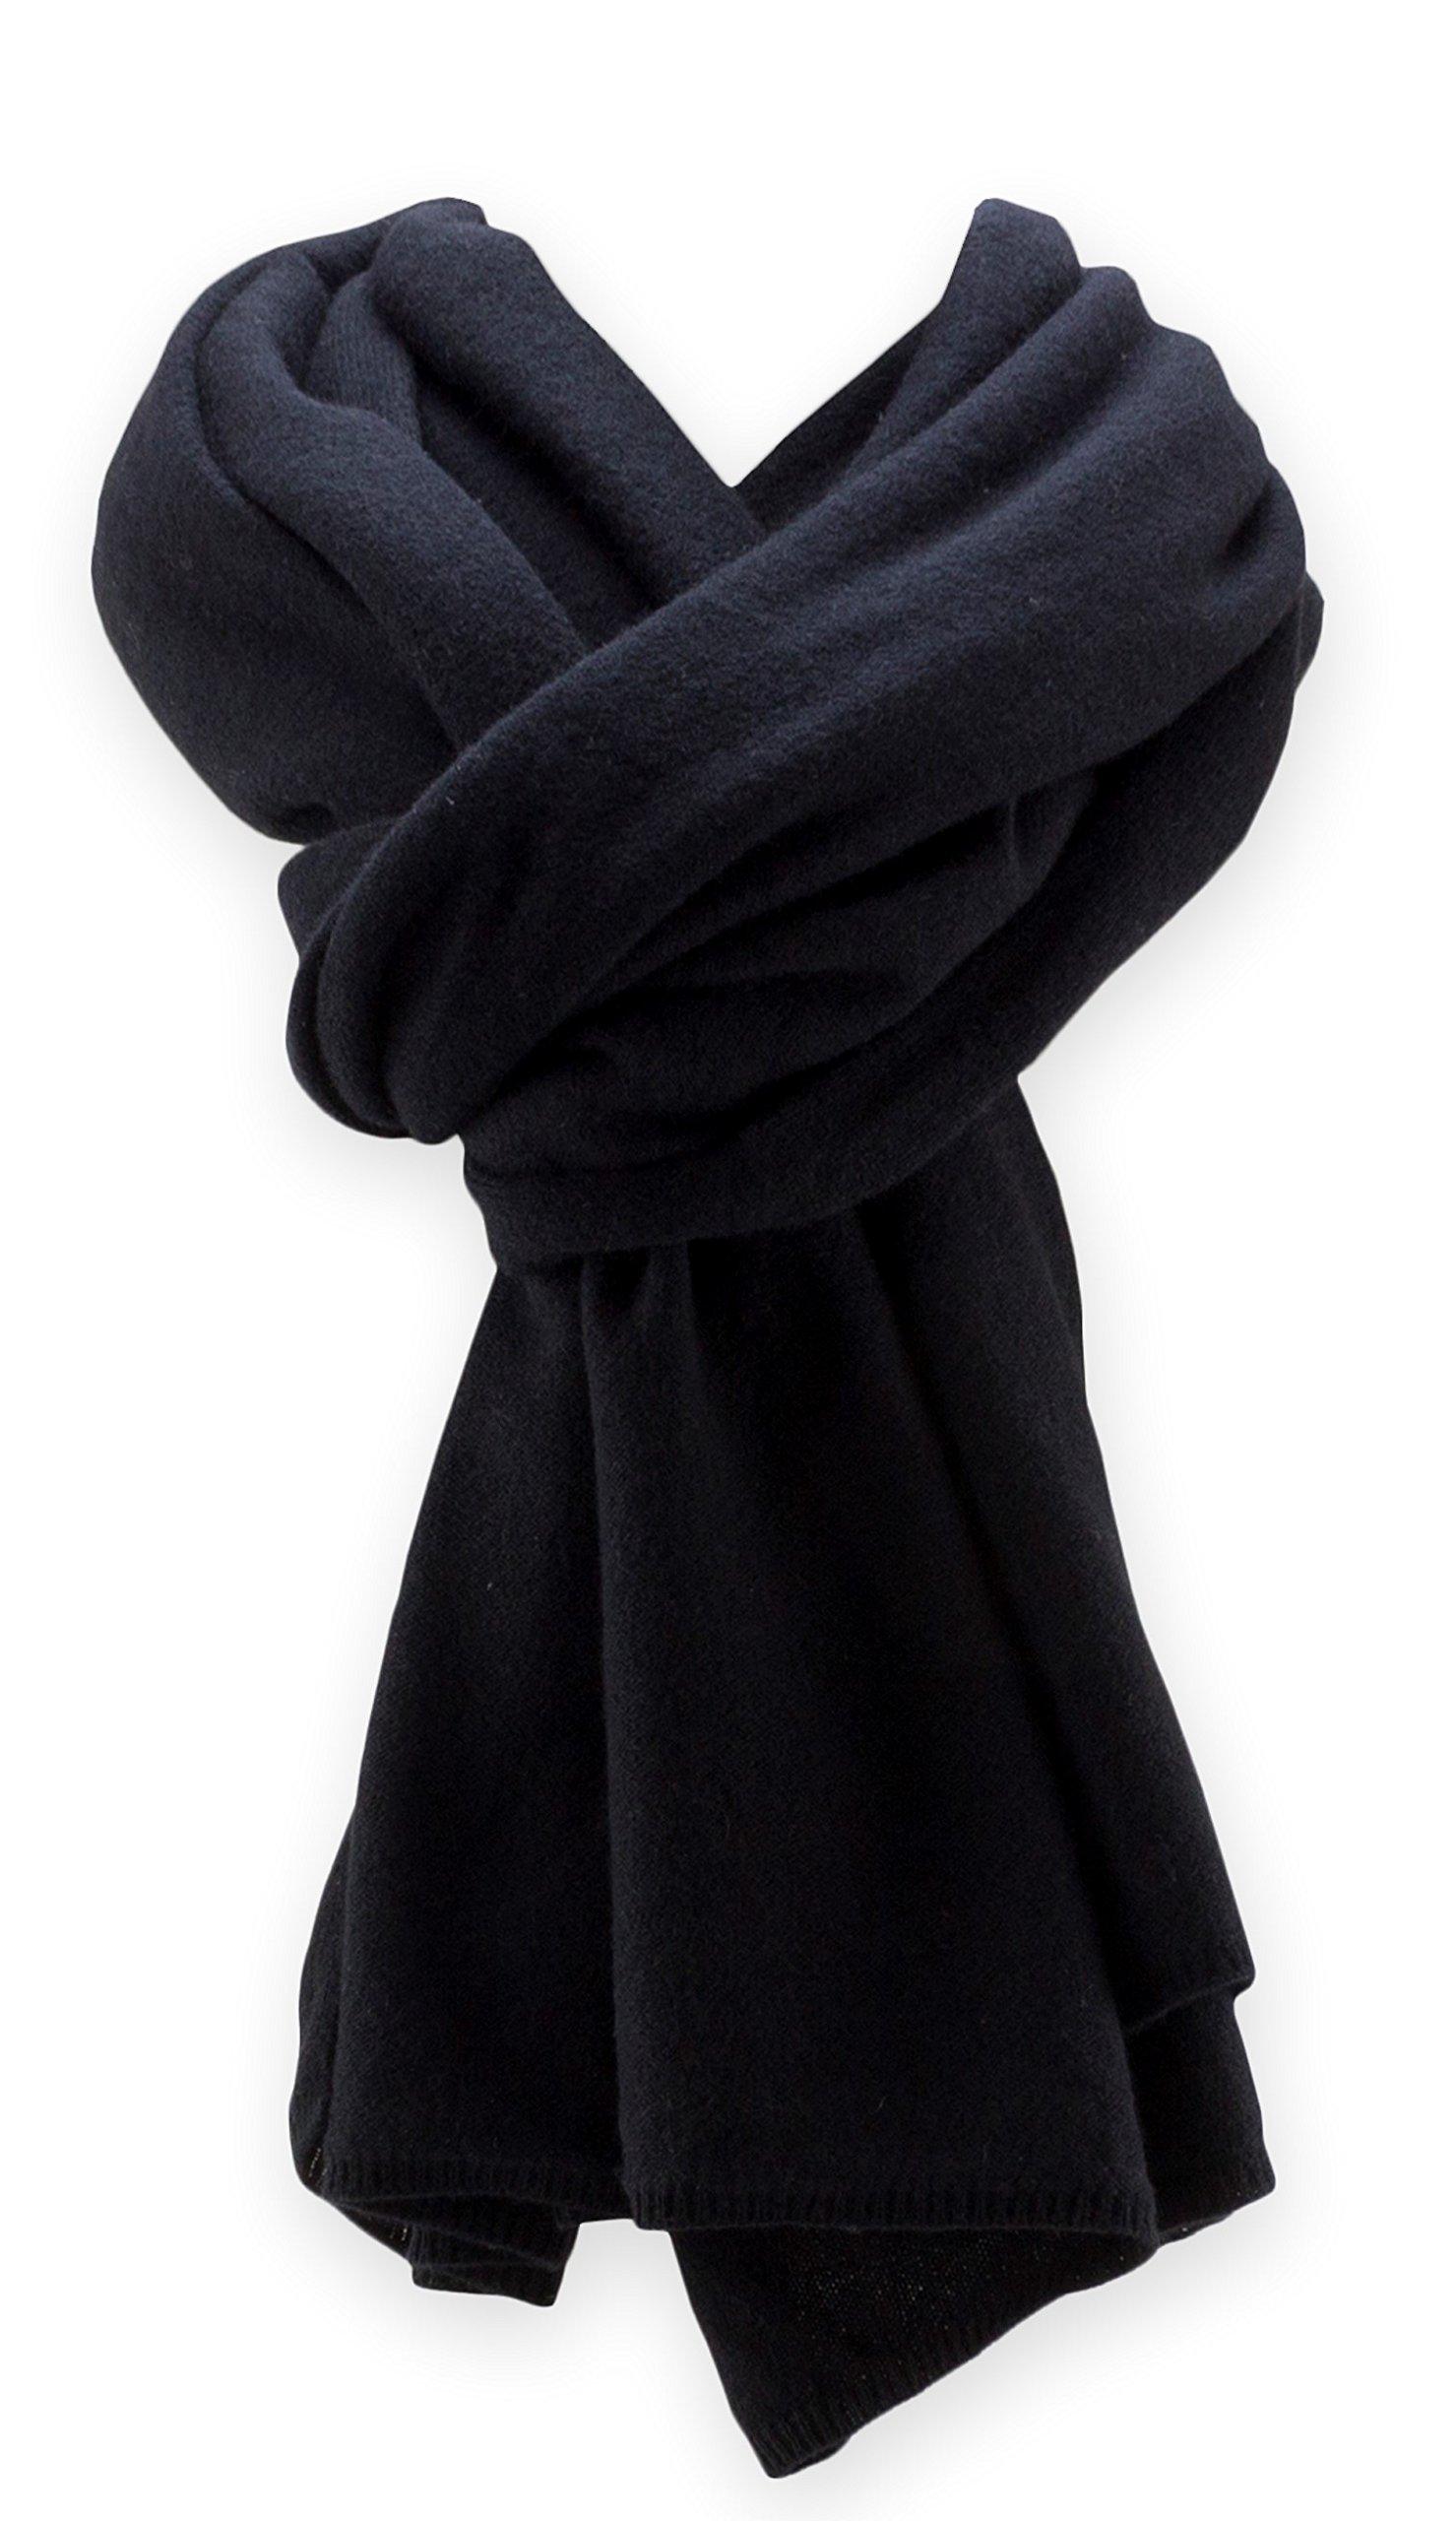 Jet&Bo 100% Pure Cashmere Travel Wrap, Scarf & Blanket